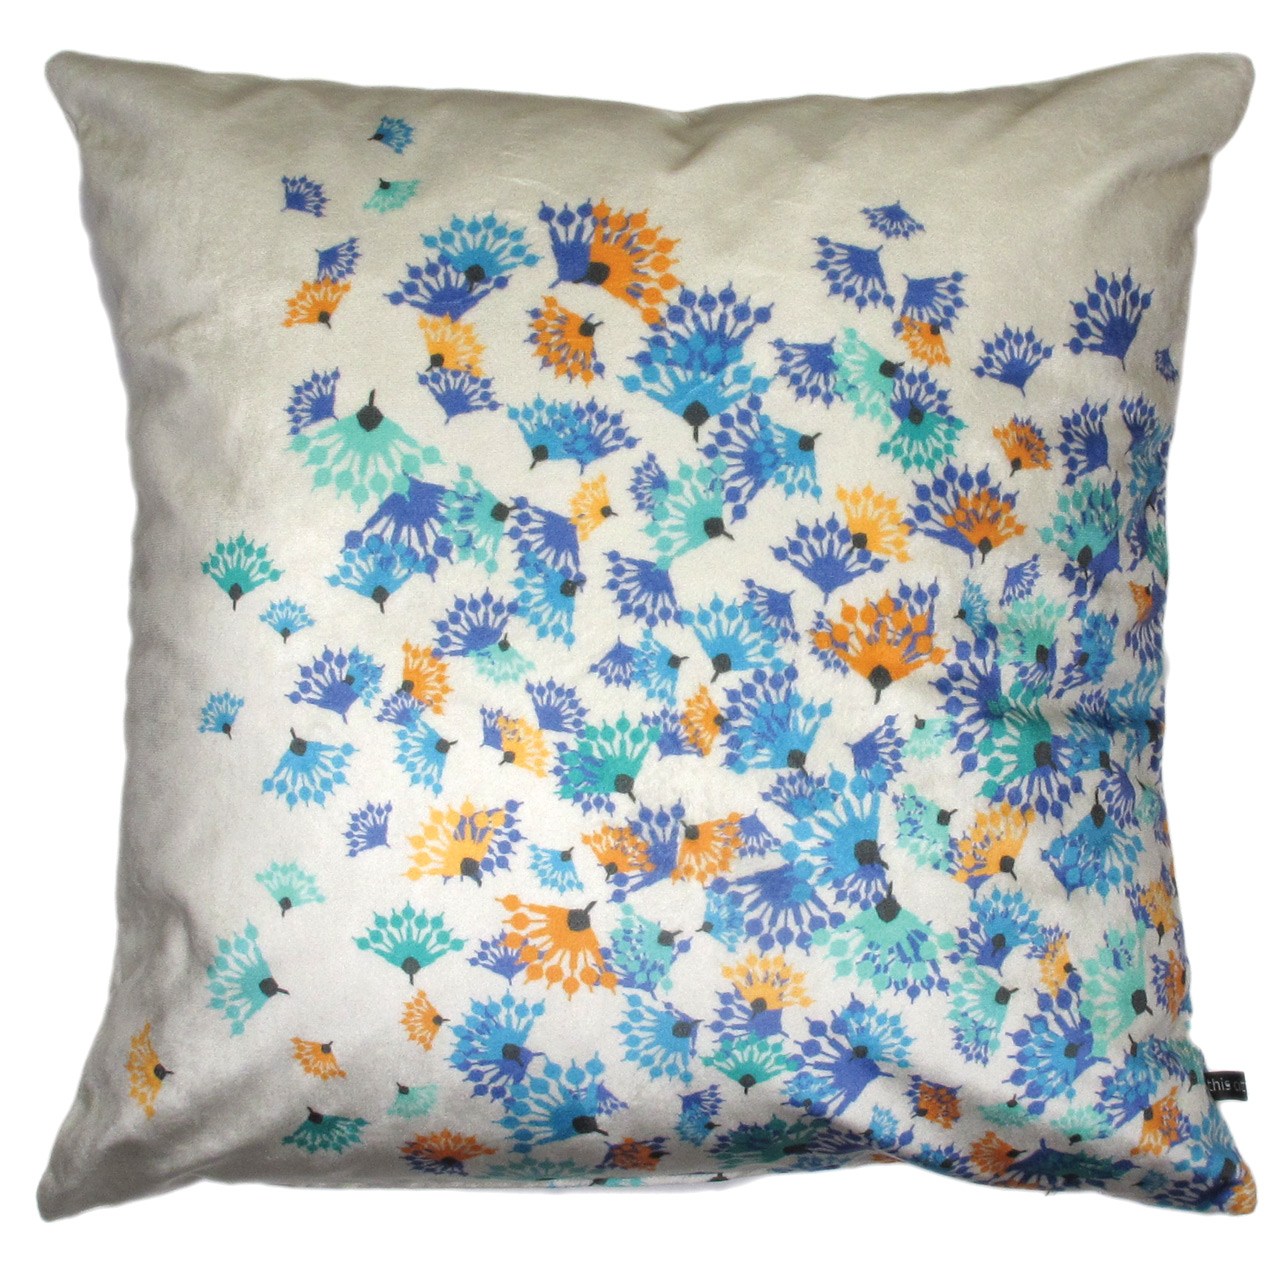 Kissenbezug Samt, Flying Flowers creme